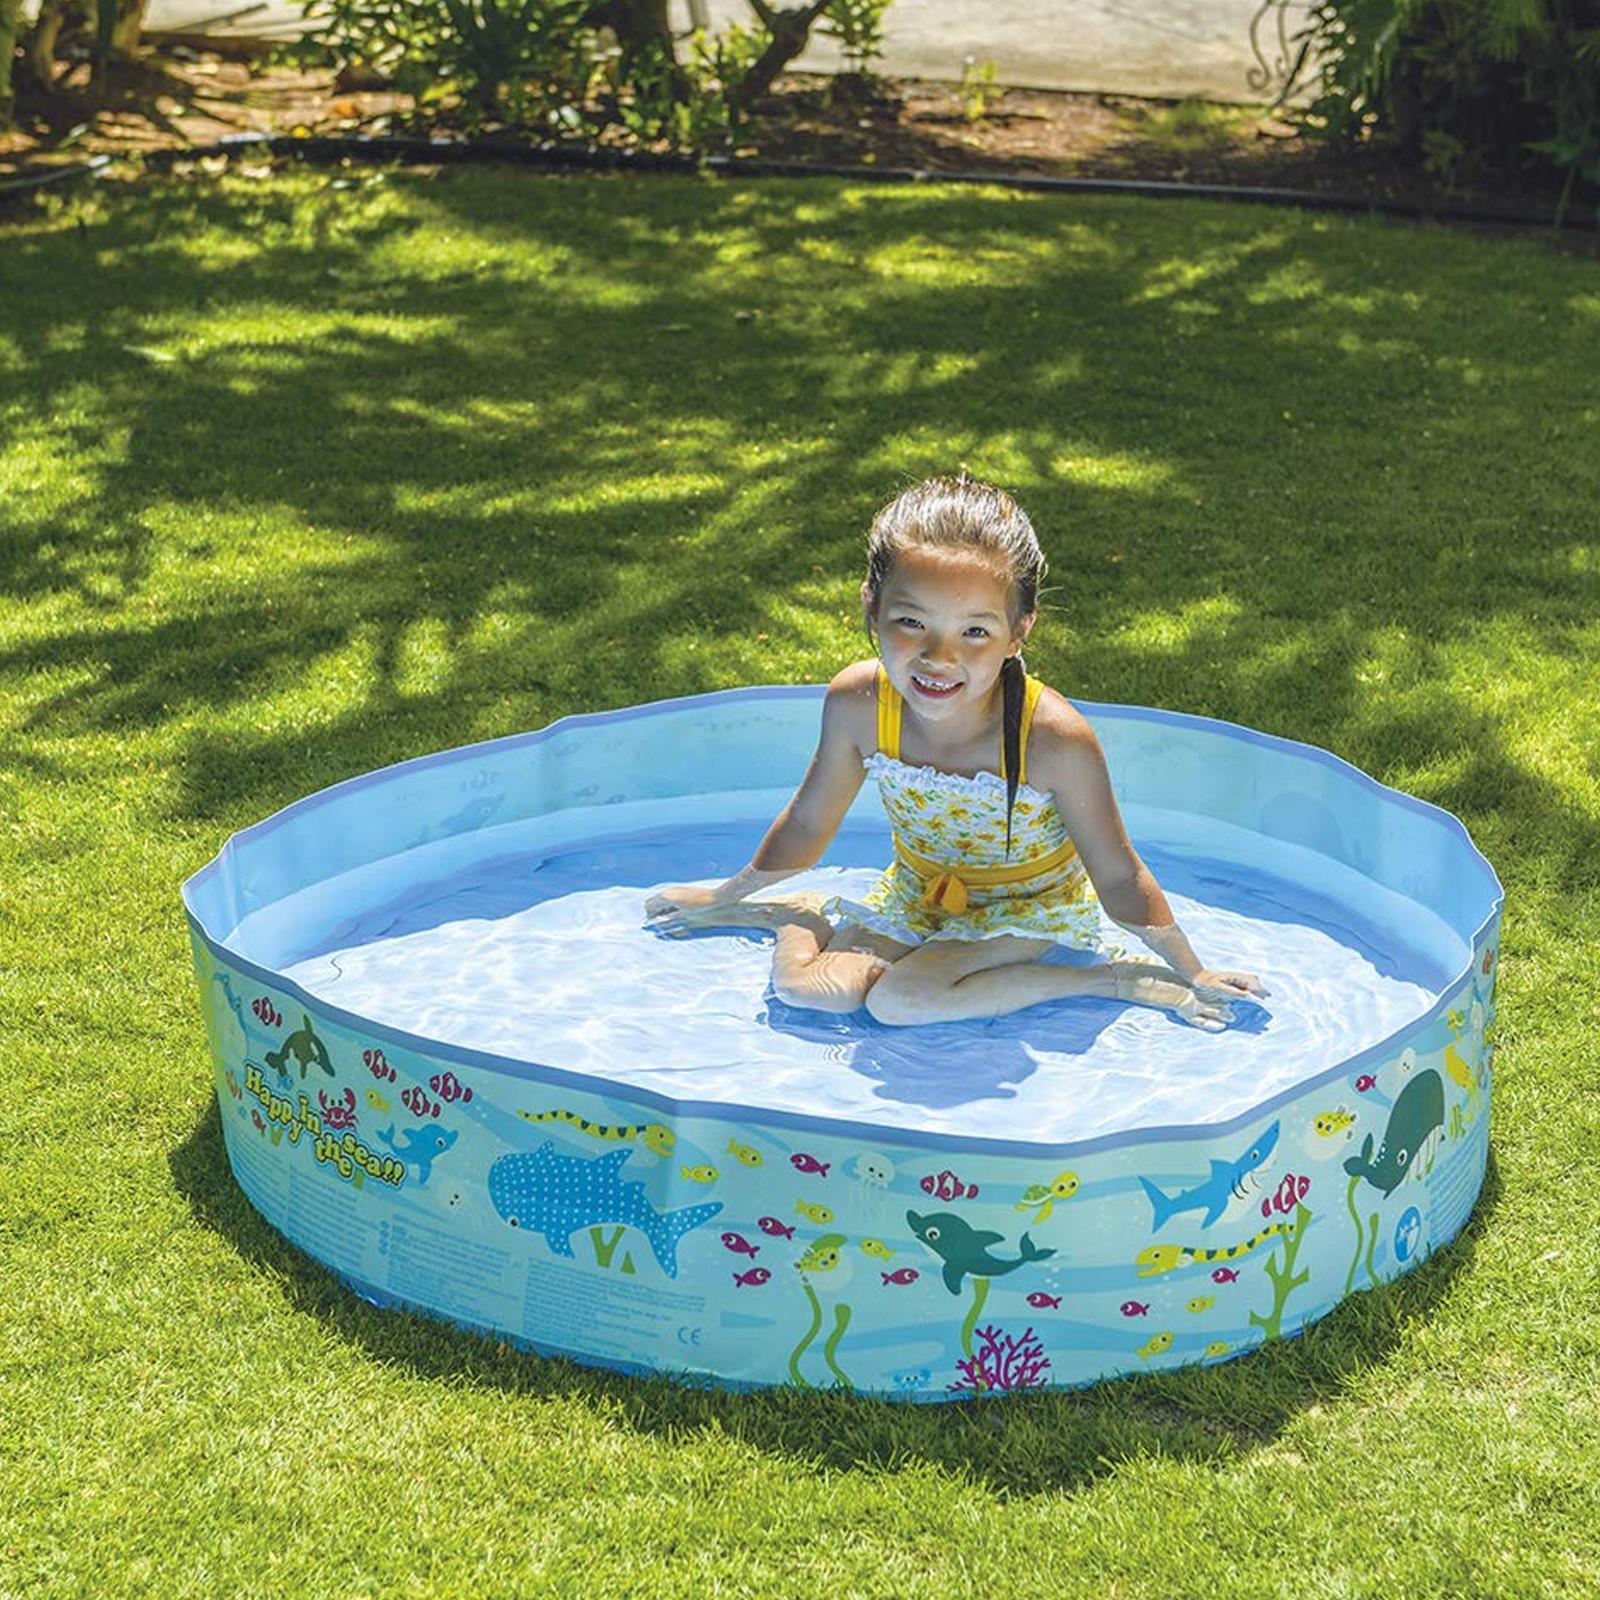 Centro-De-Juegos-De-Natacion-Ninos-Ridgid-Pared-piscina-infantil-Mar-Vida-al-Aire-Libre-diversion miniatura 9